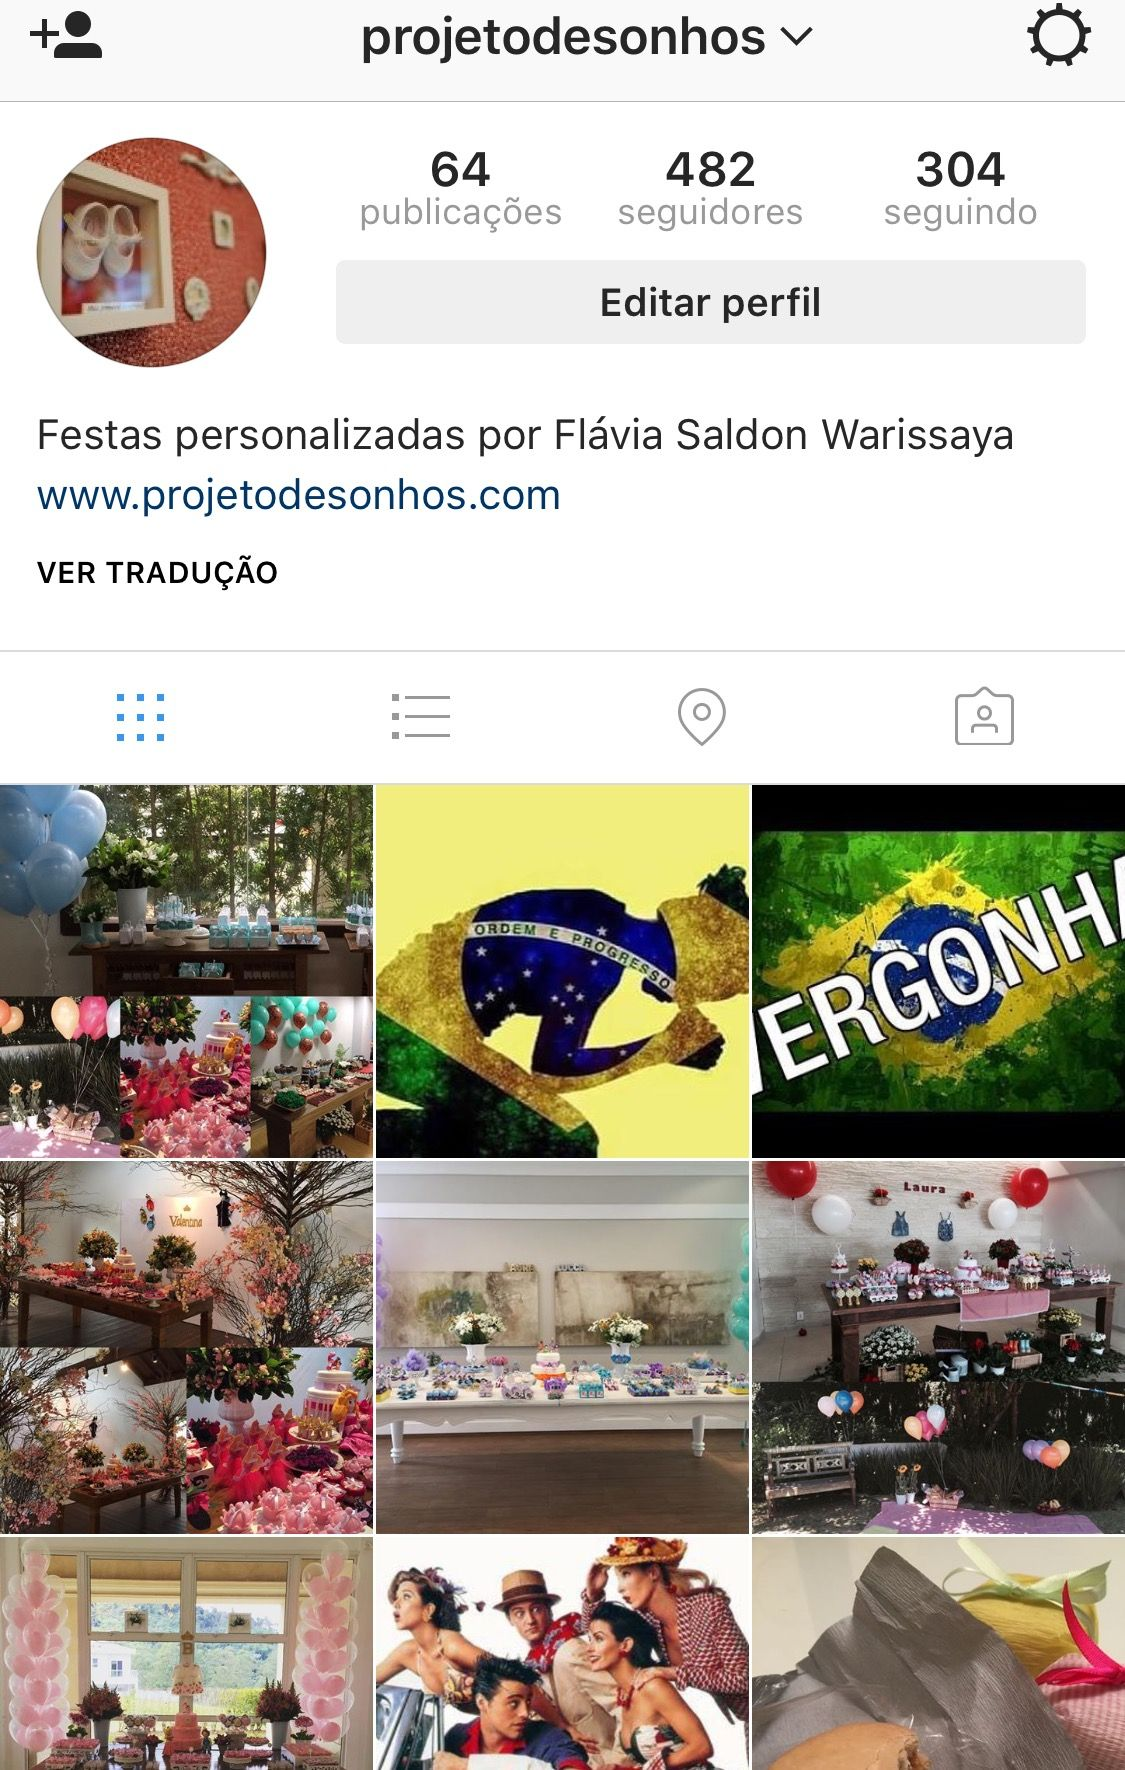 @projetodesonhos Instagram